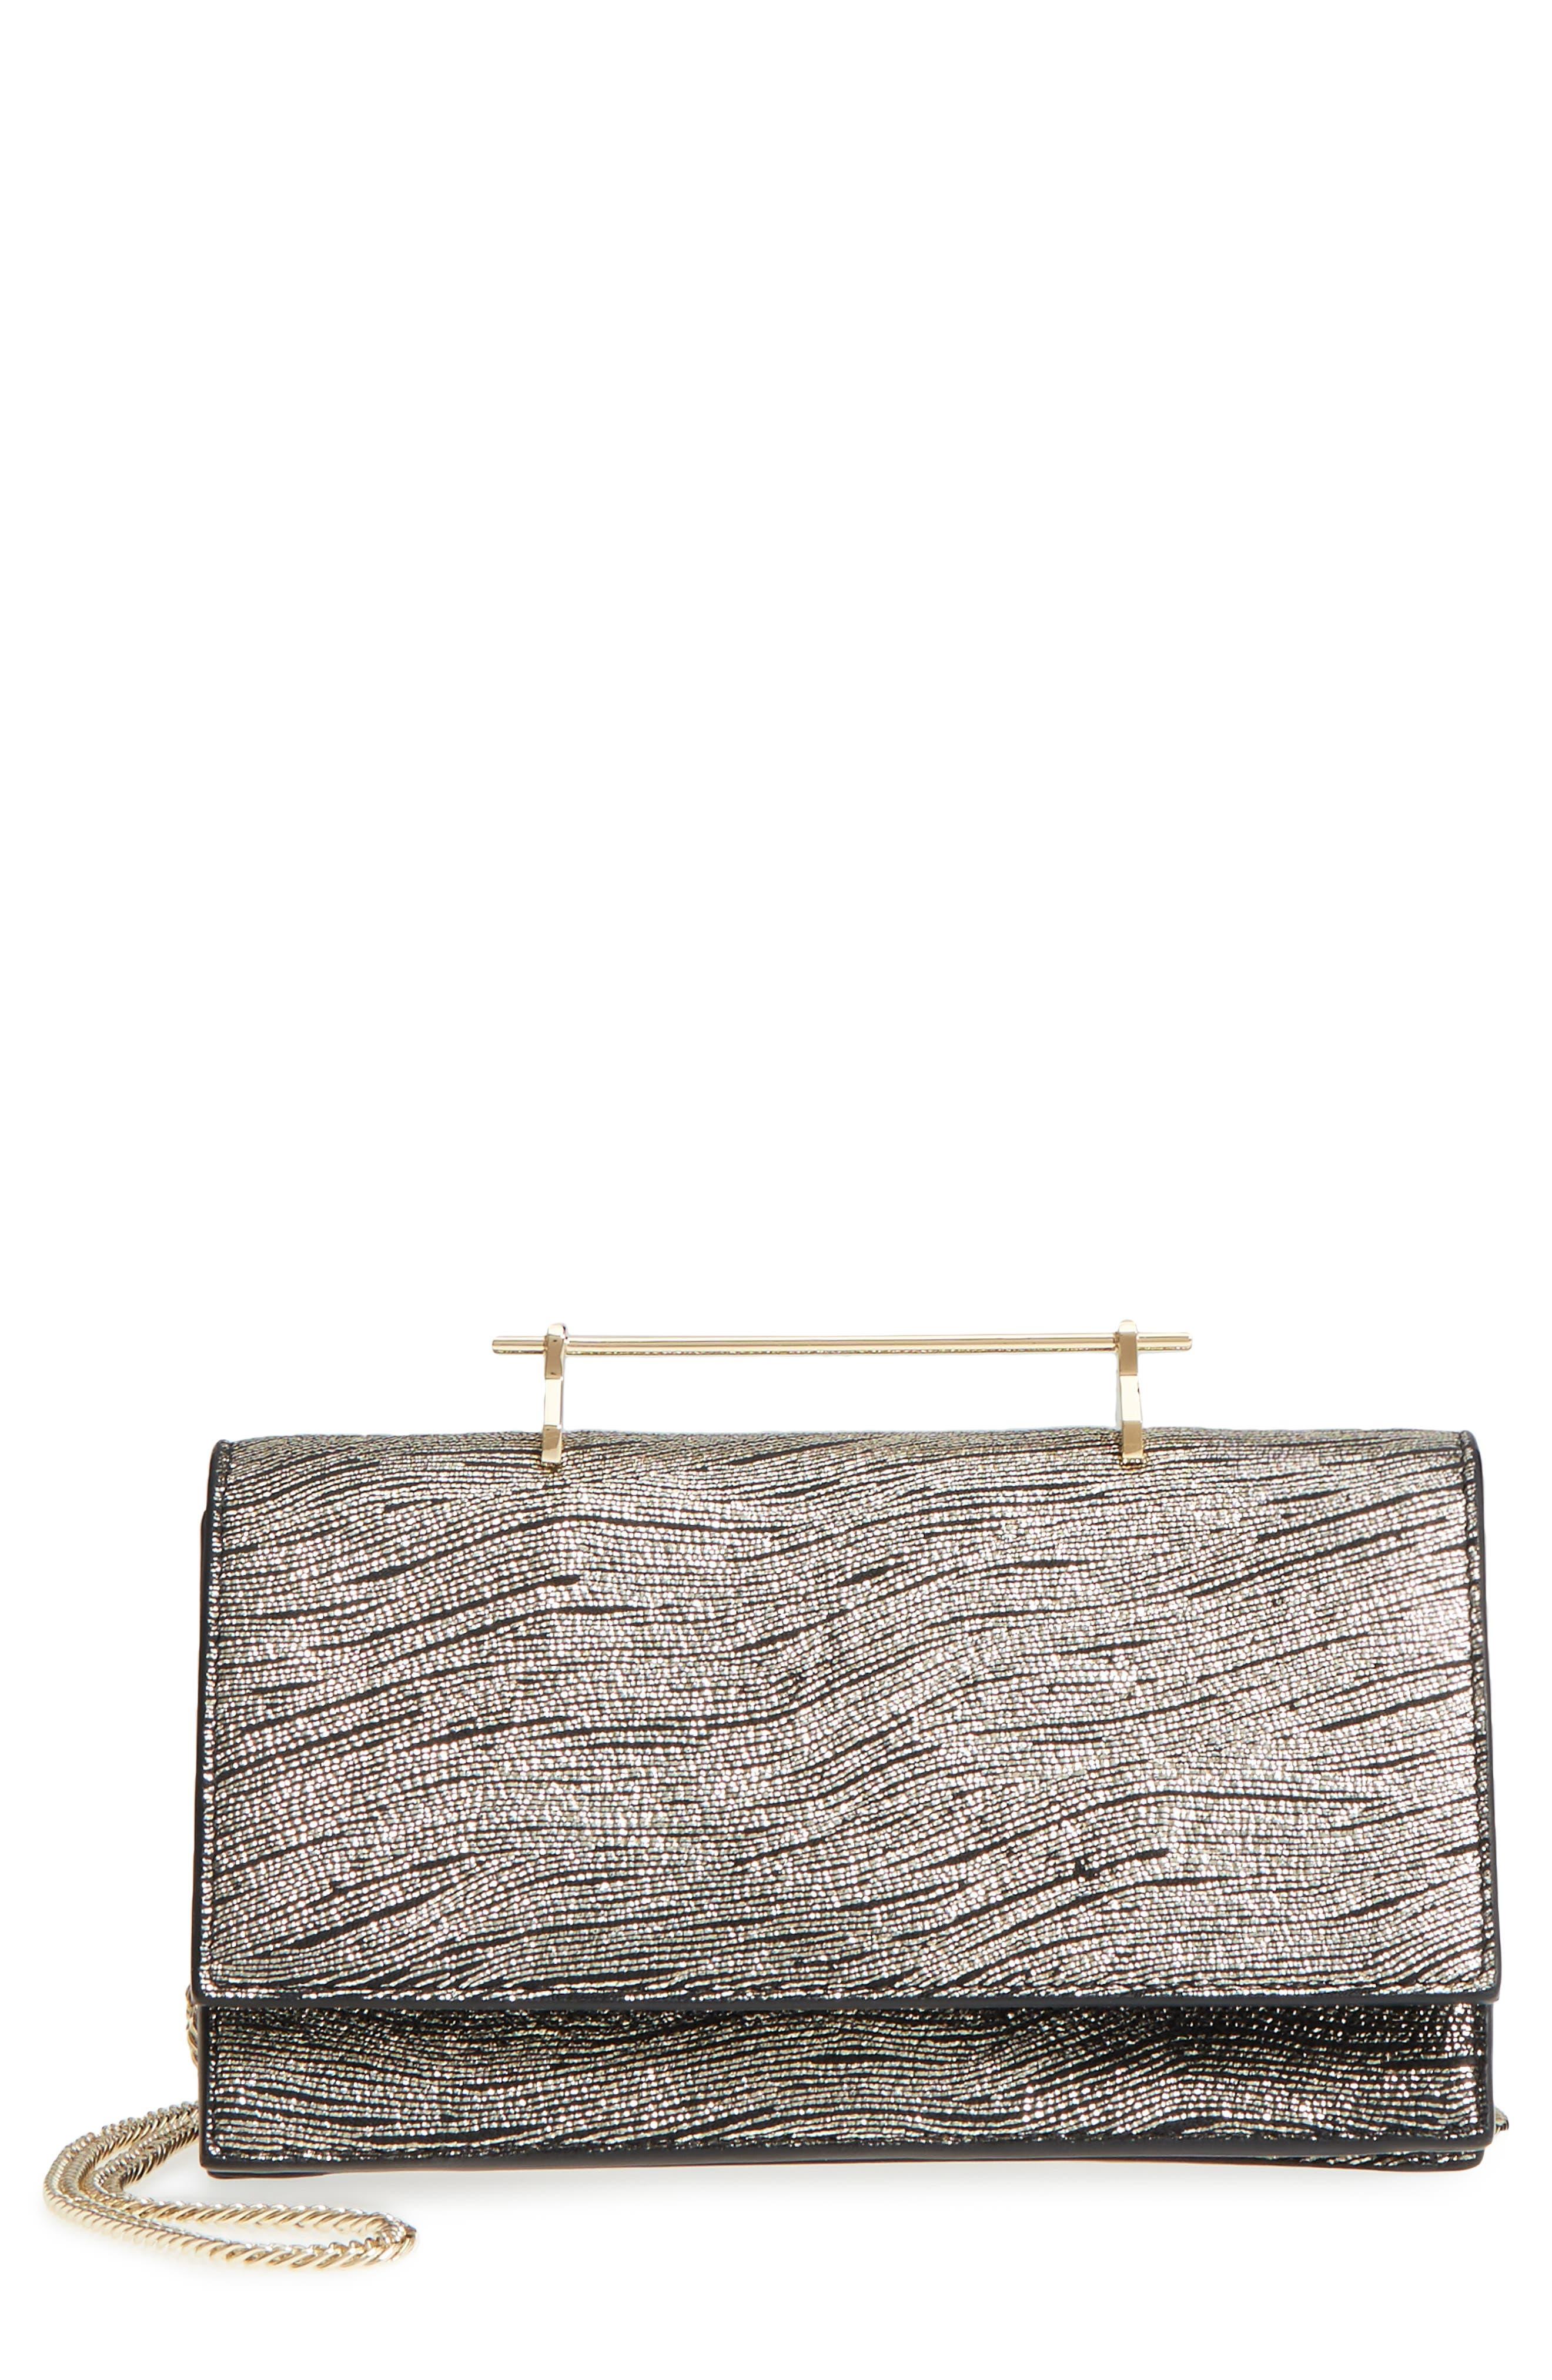 Alexia Metallic Calfskin Leather Clutch,                         Main,                         color, 710